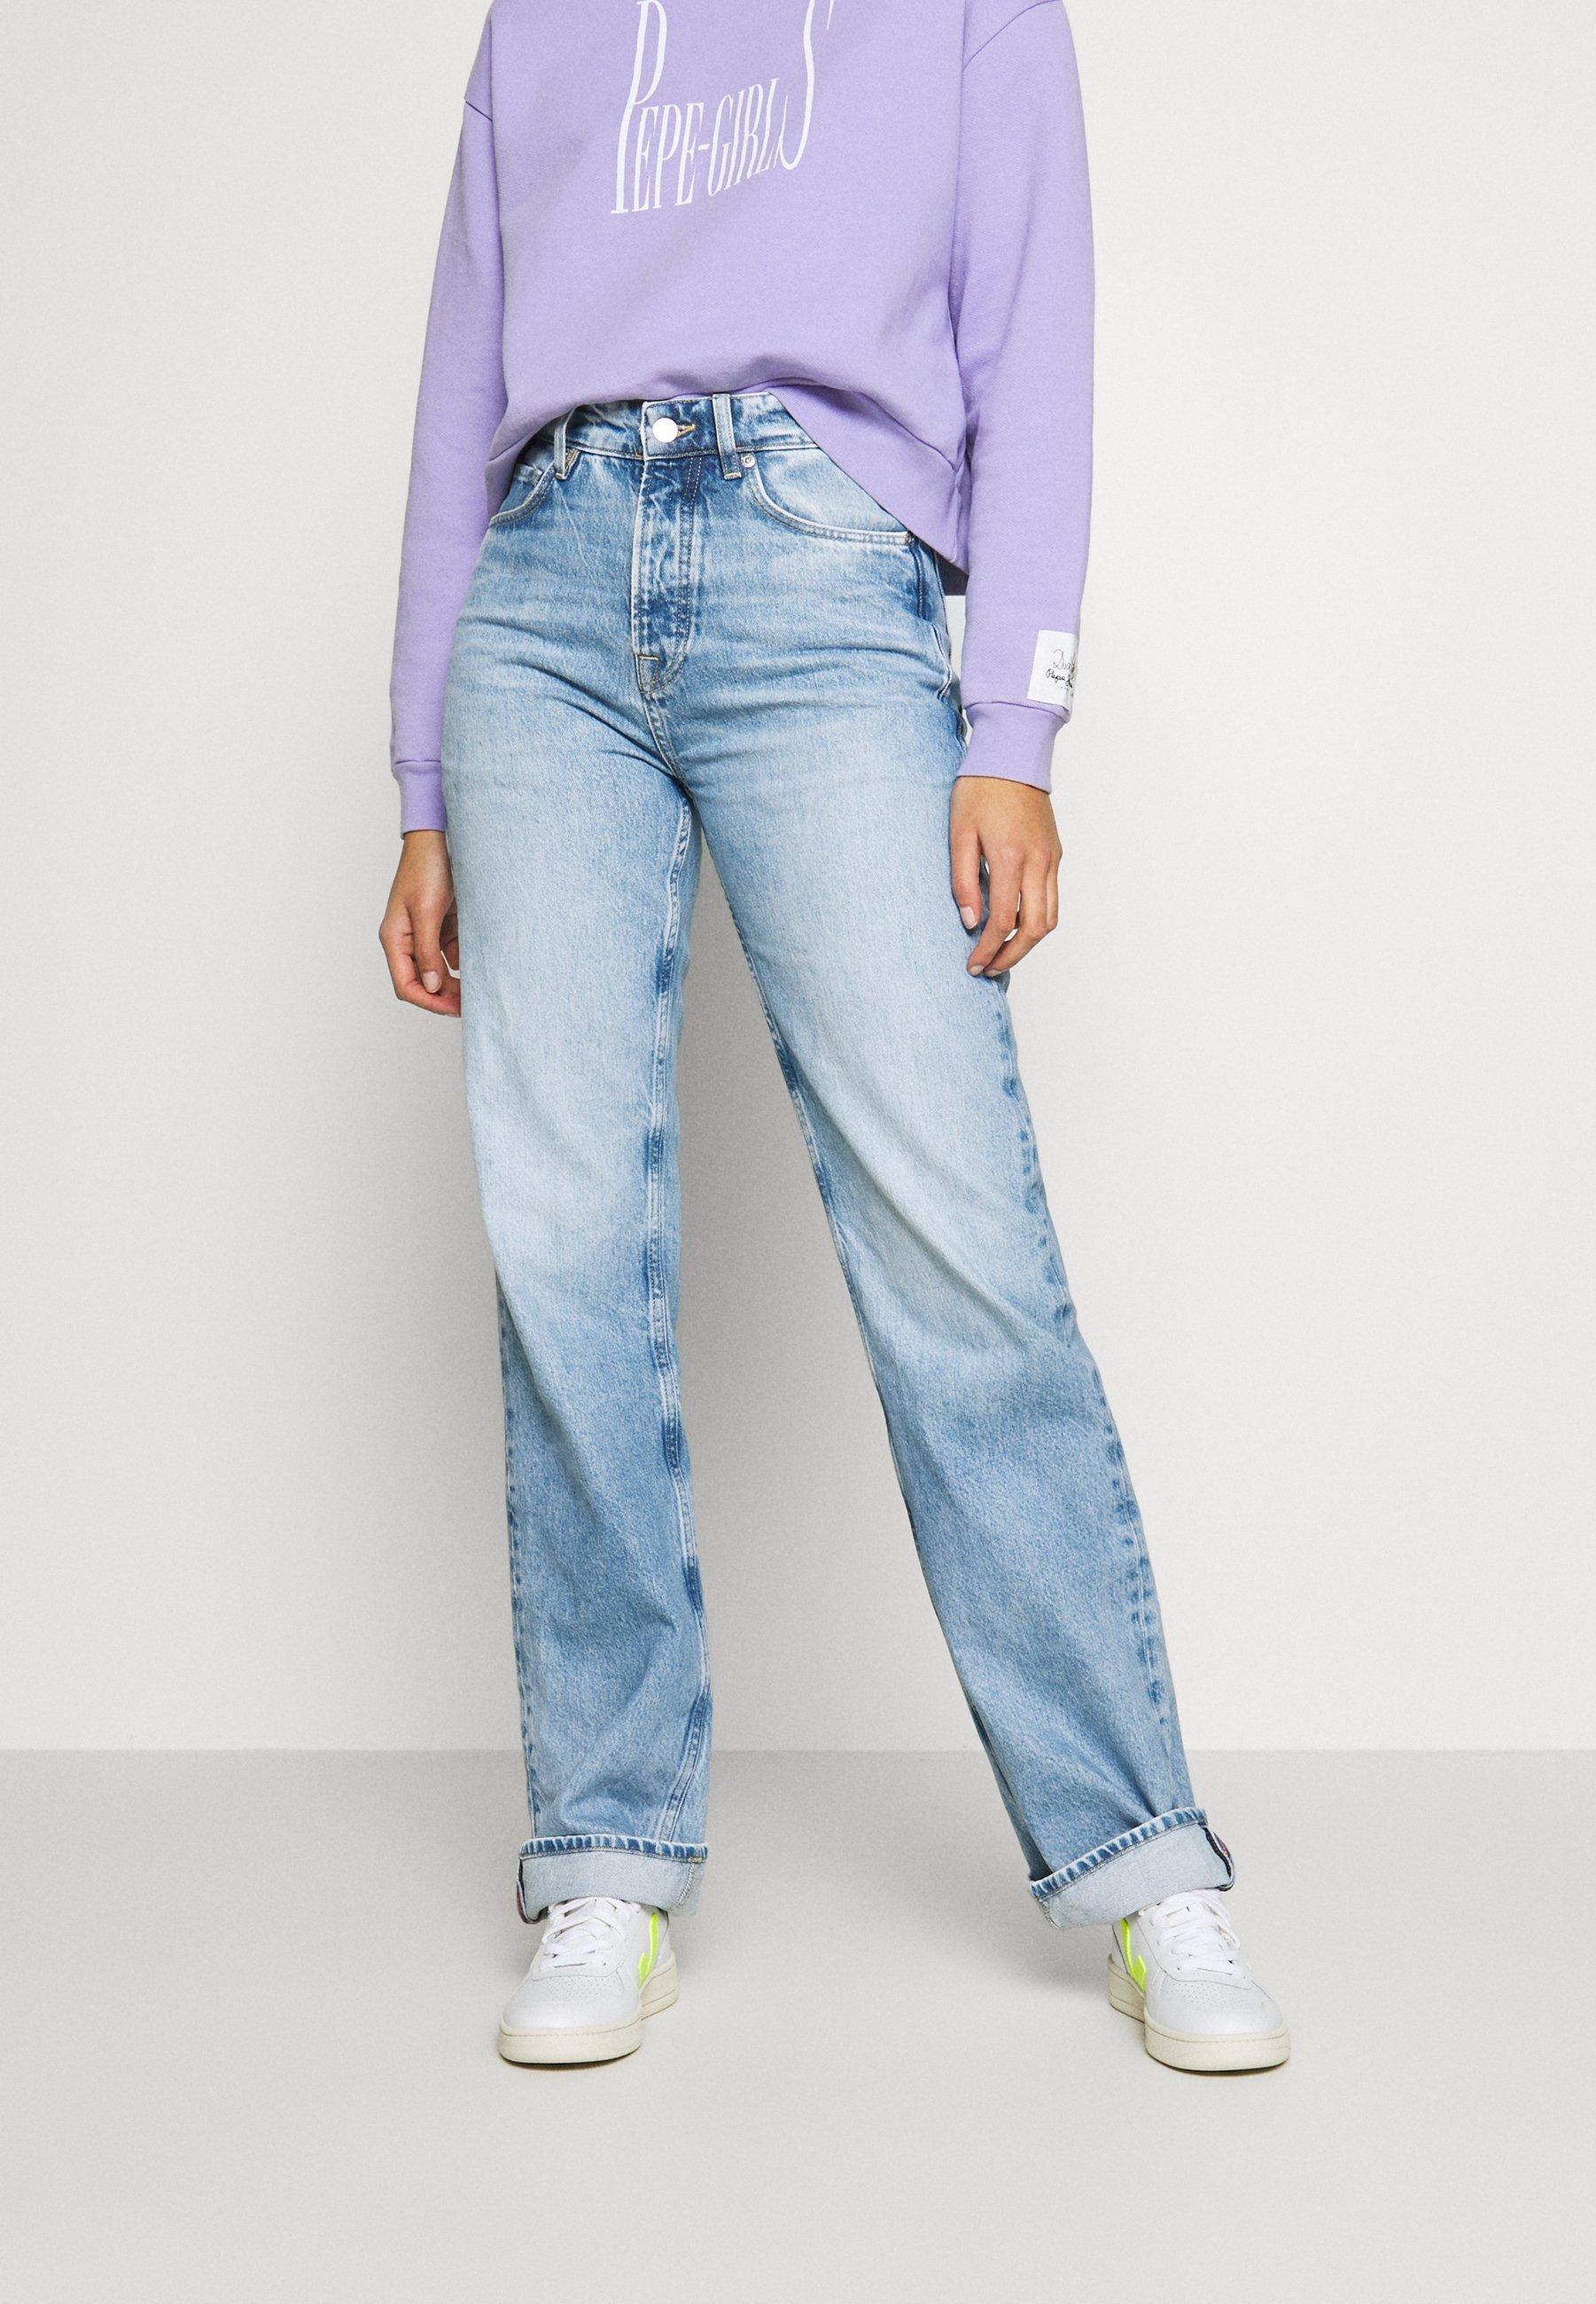 DUA LIPA x PEPE JEANS Jeans straight leg light blue denim